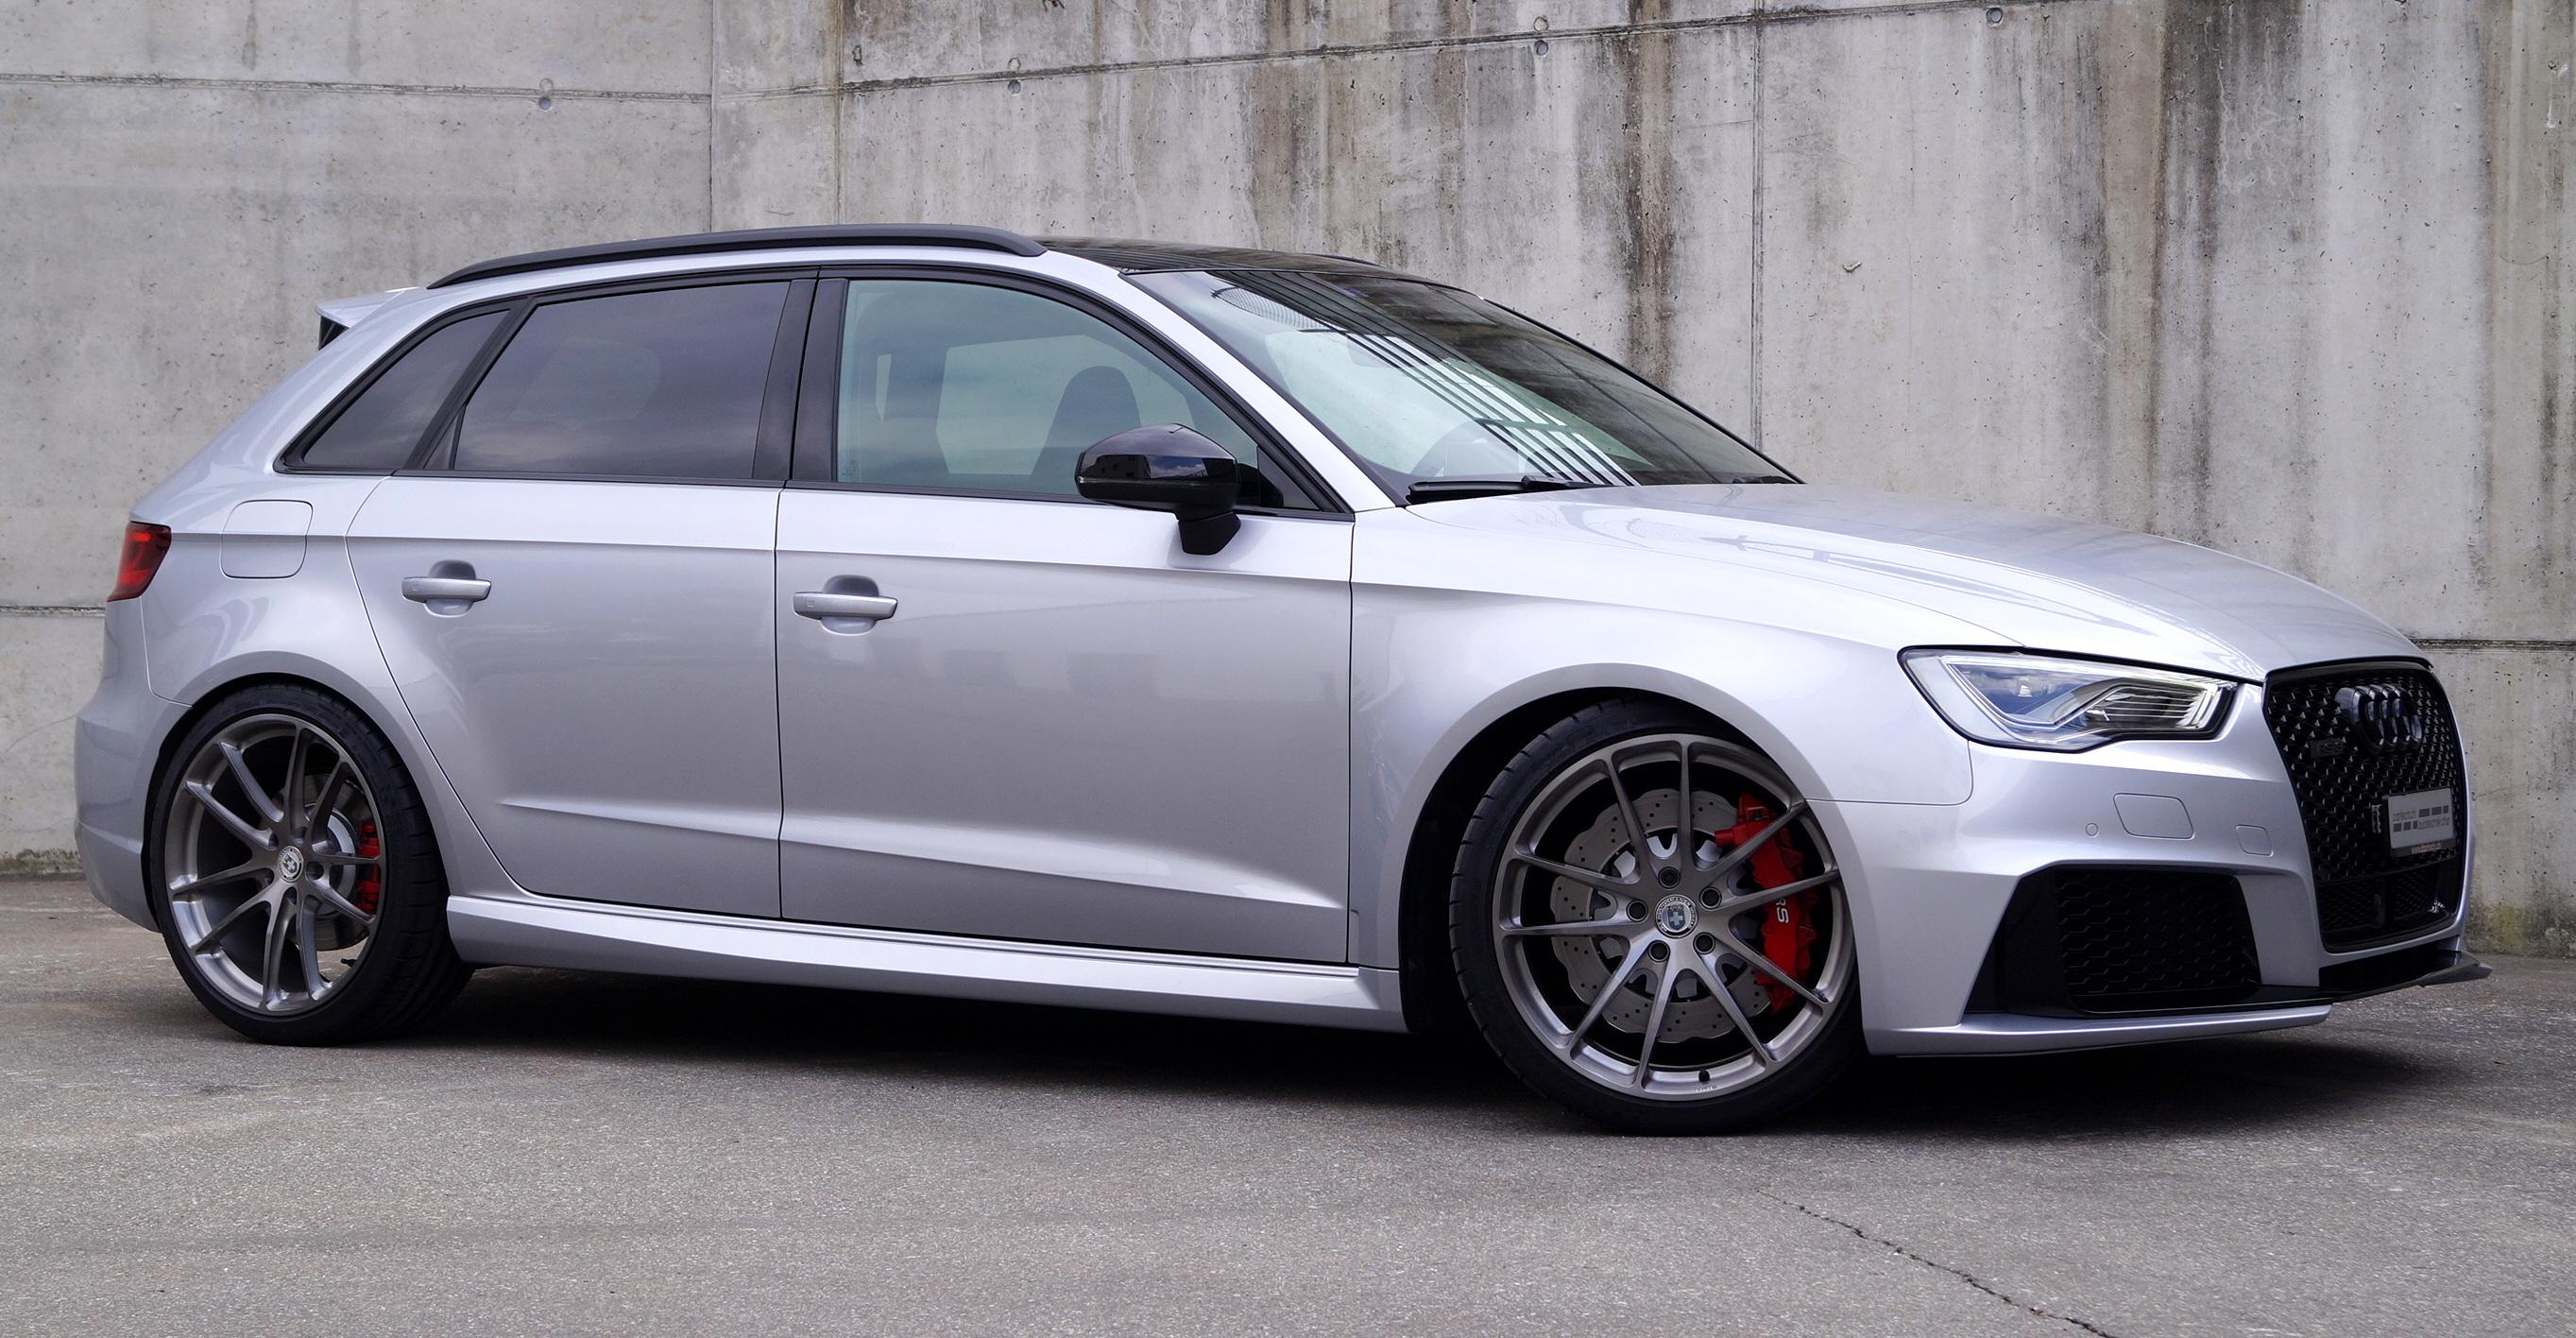 Audi Rs3 Mit Hre Felgensatz Und H Amp R Fahrwerk Cartech Ch Autotechnik Ag Chur